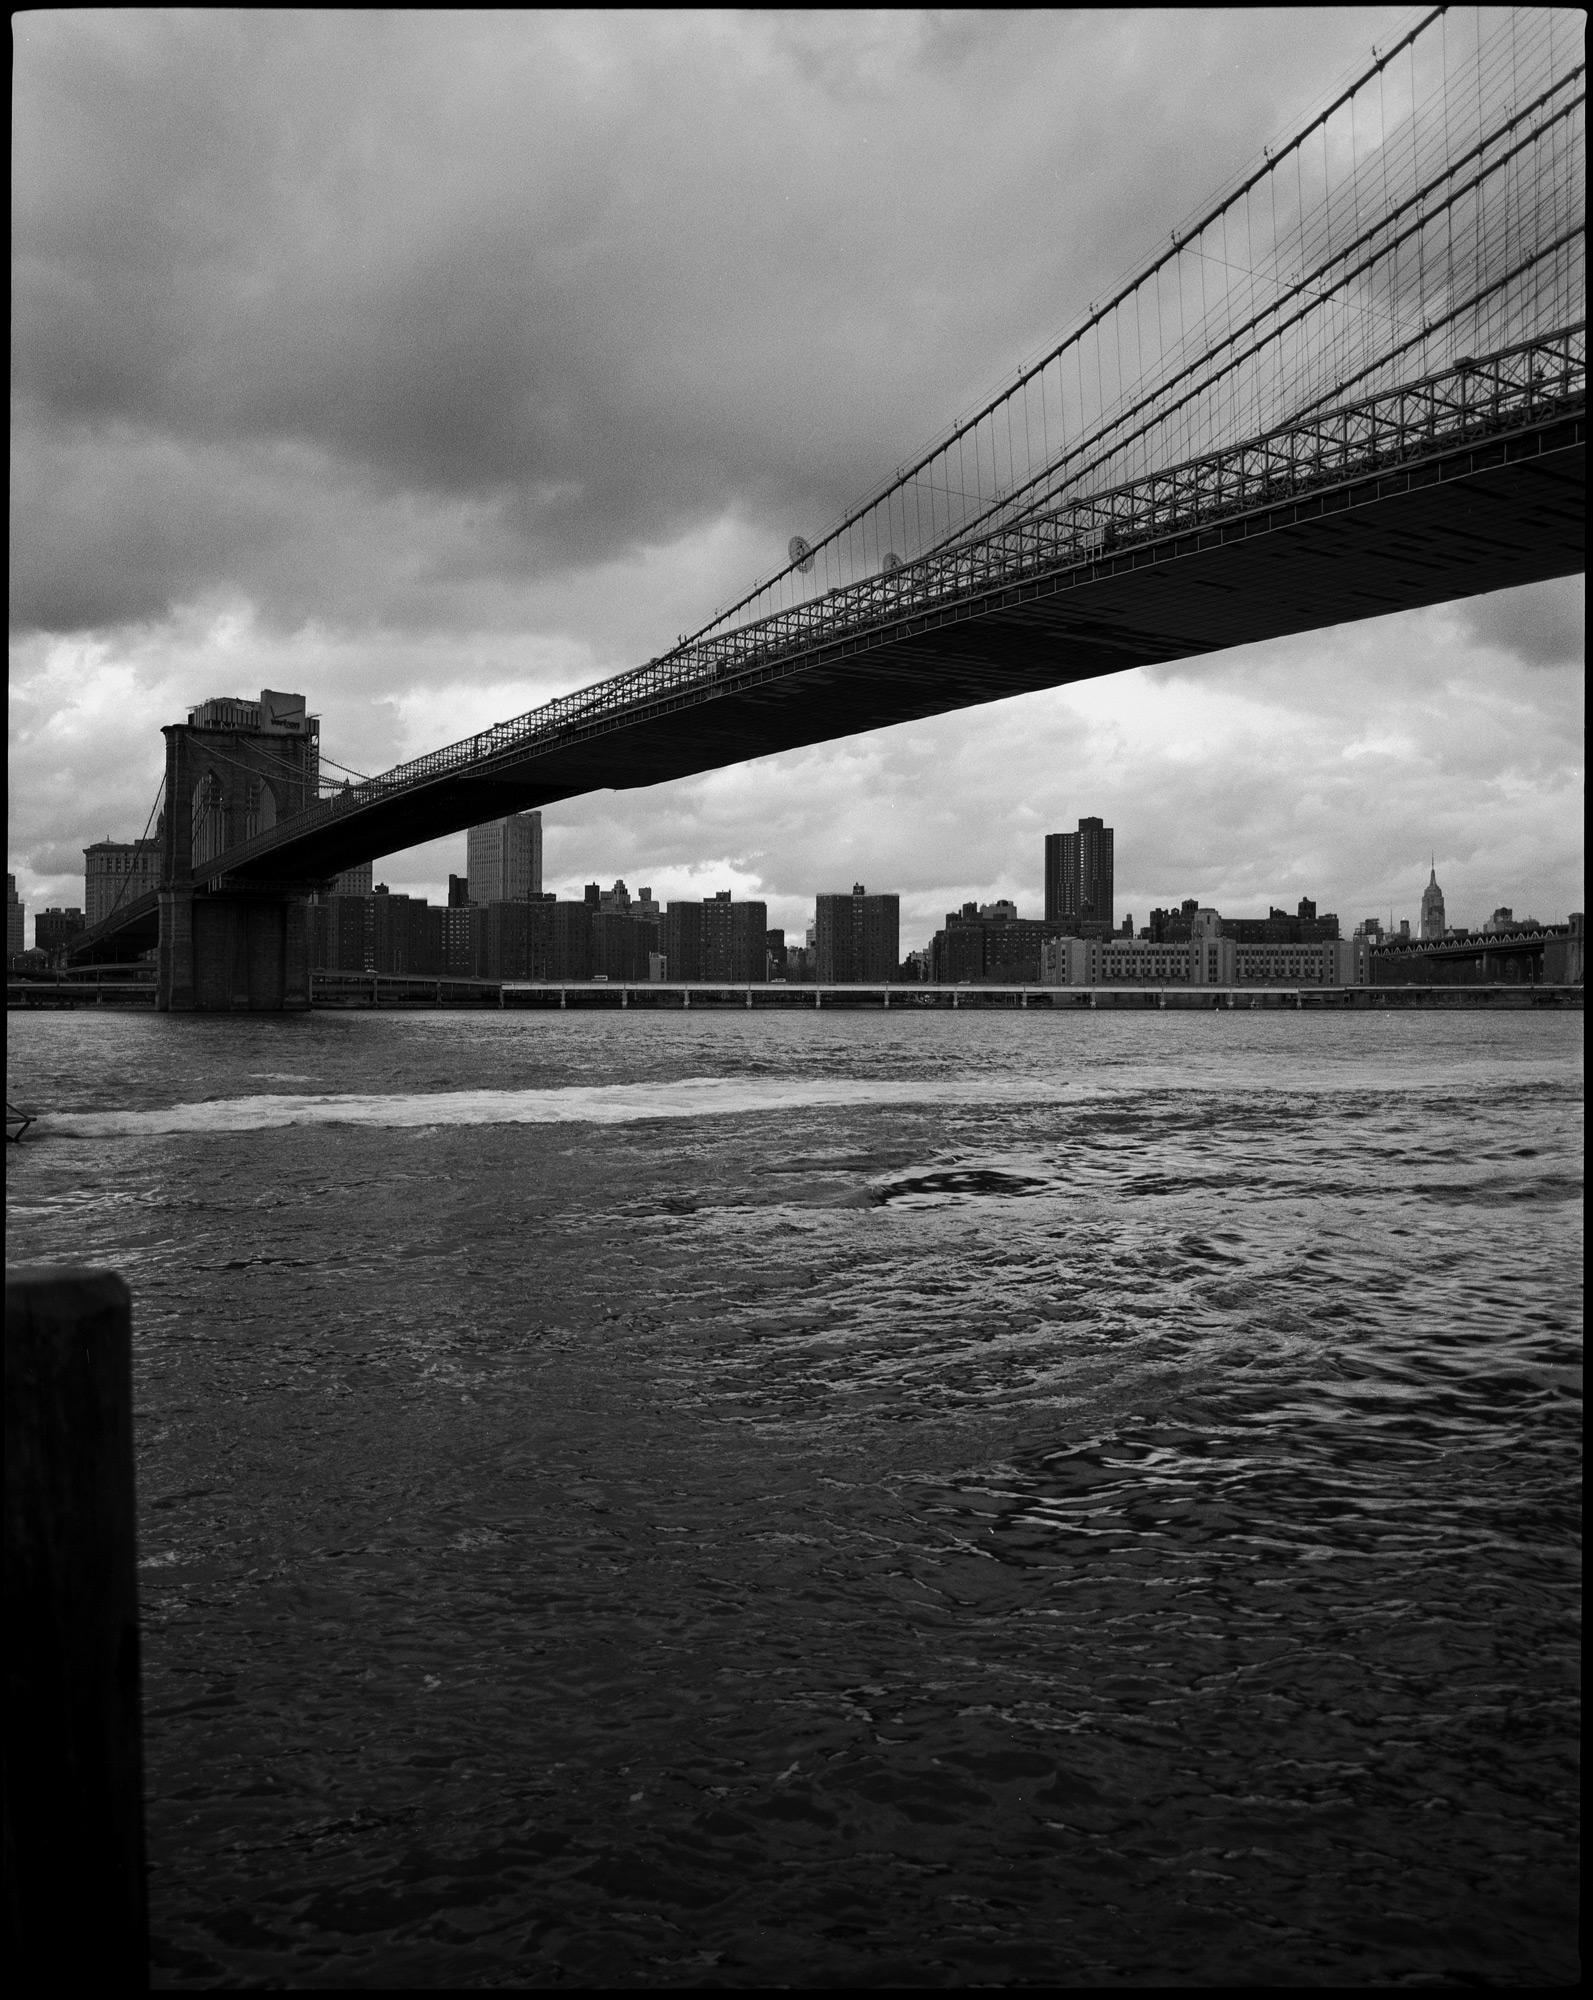 Brooklyn Bridge 2016, black and white cityscape by Ioannis Koussertari.